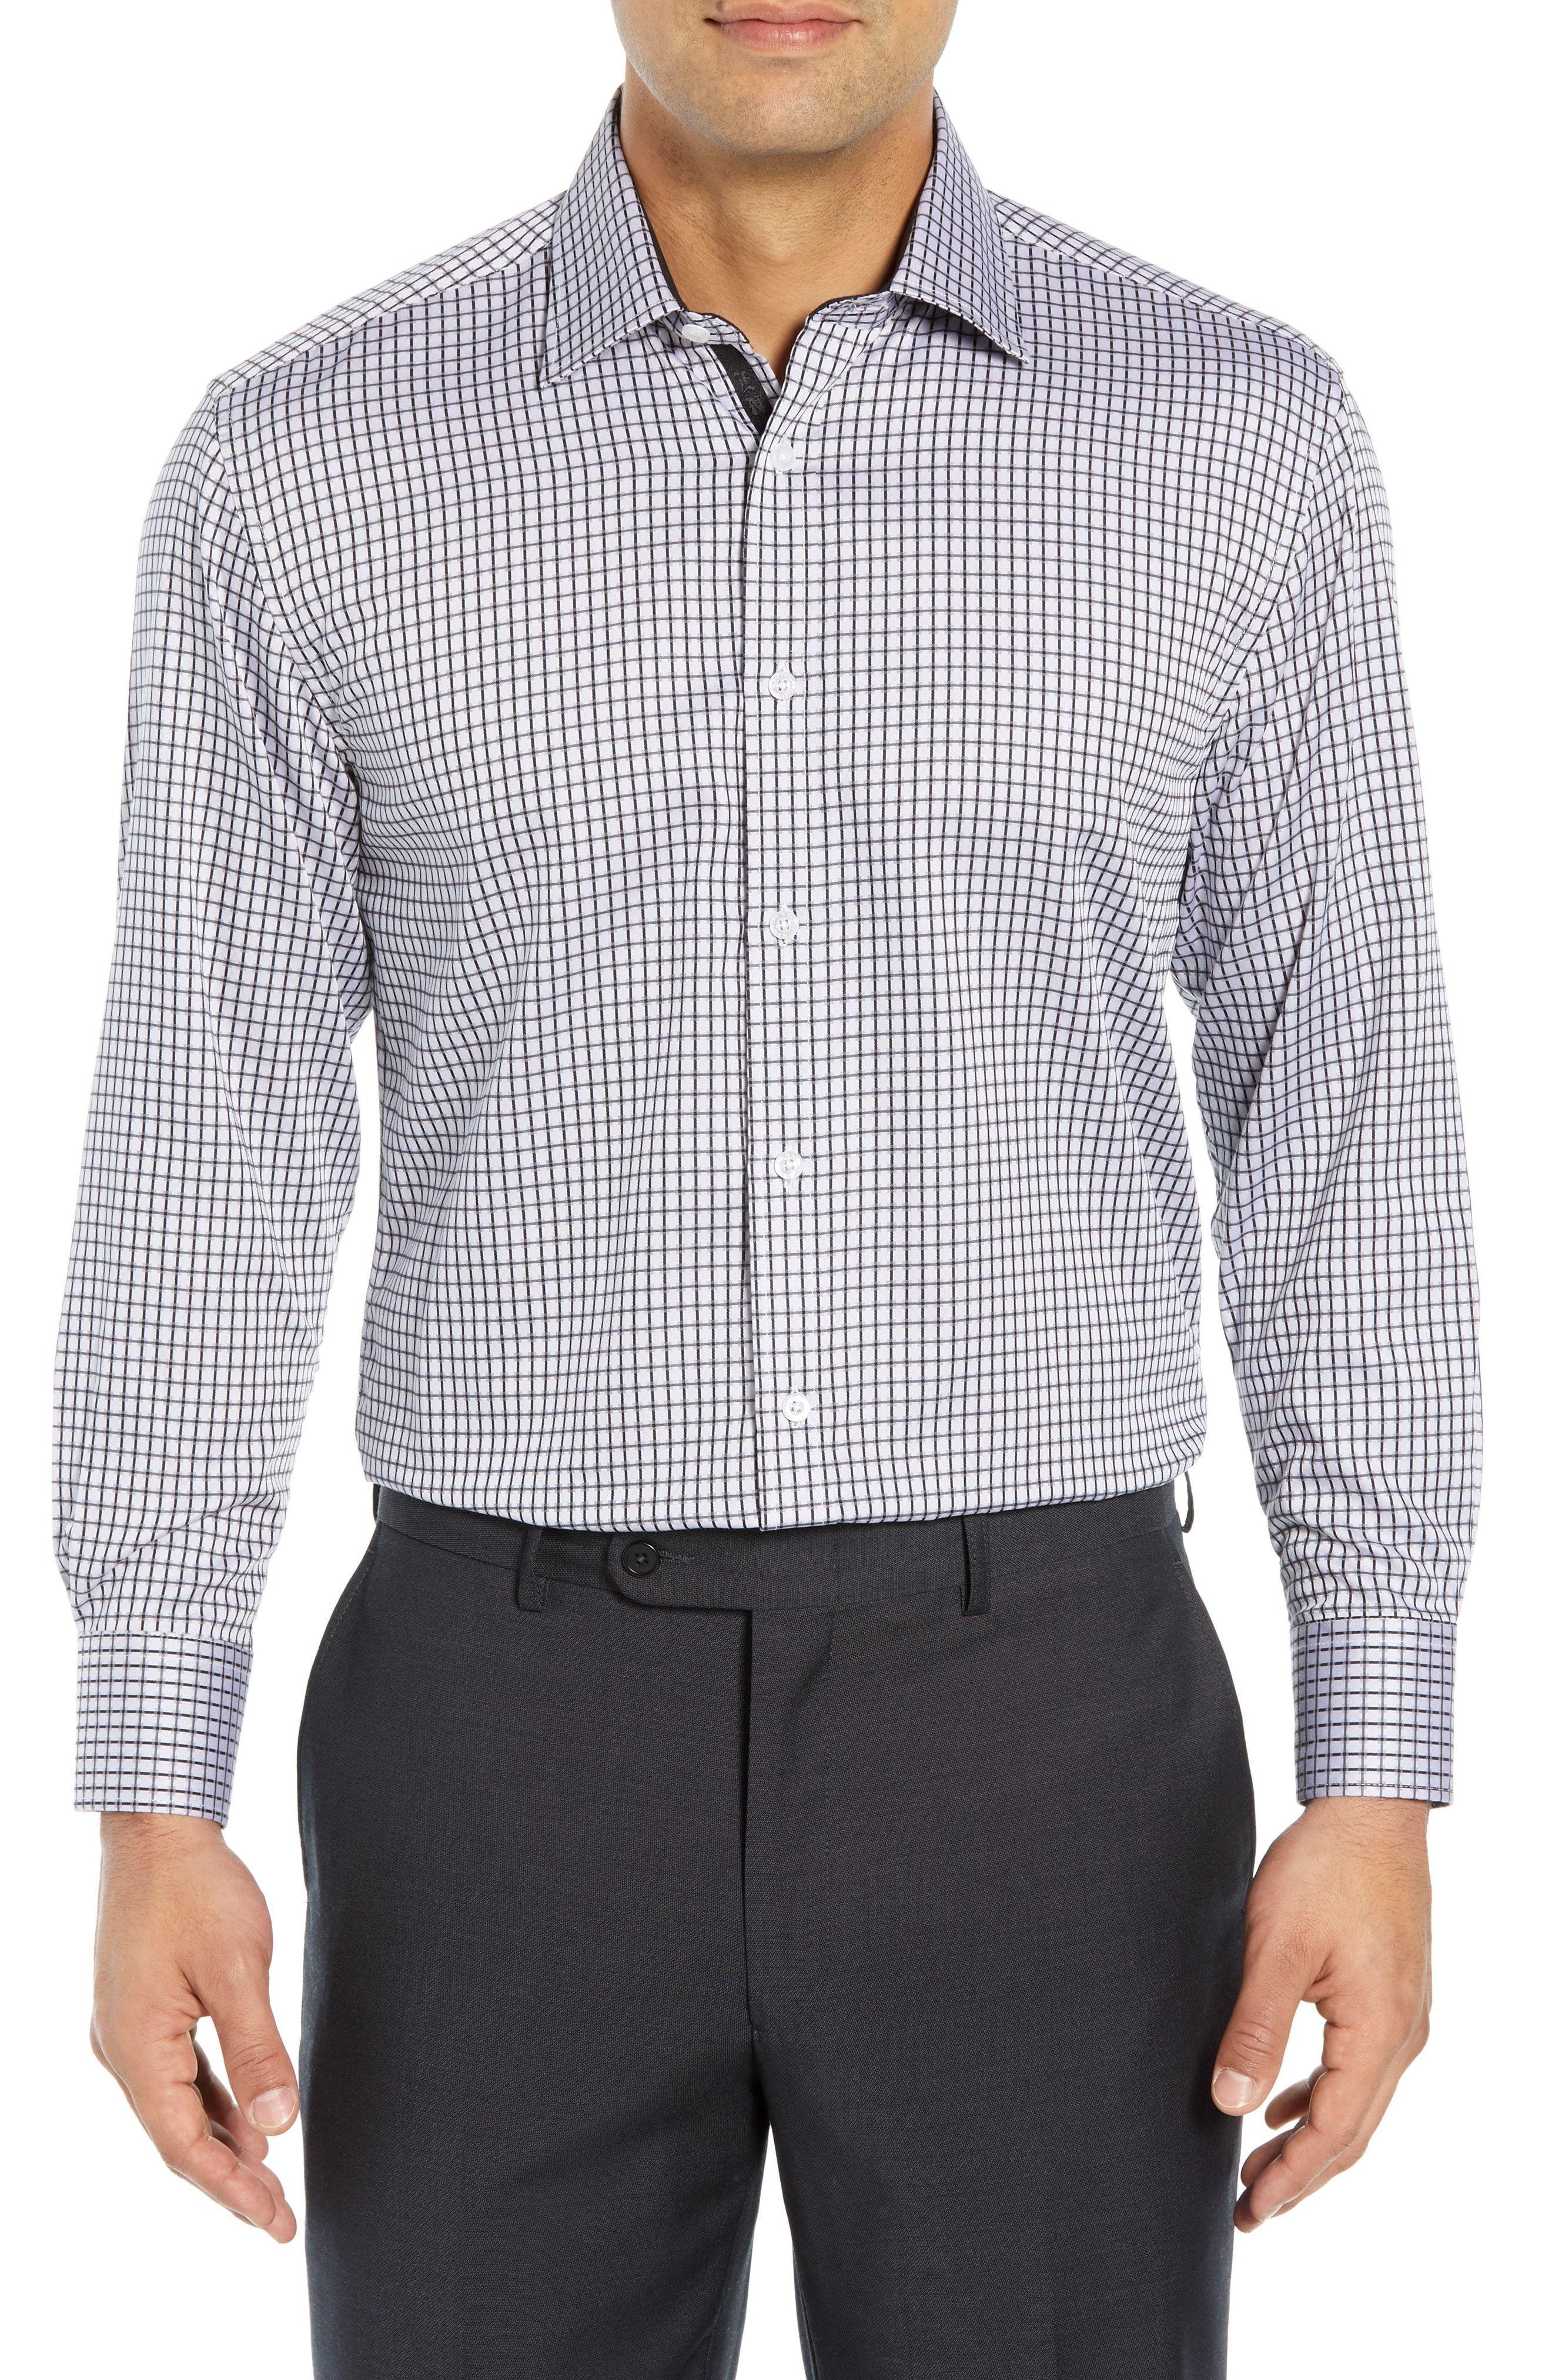 Regular Fit Check Dress Shirt In Grey